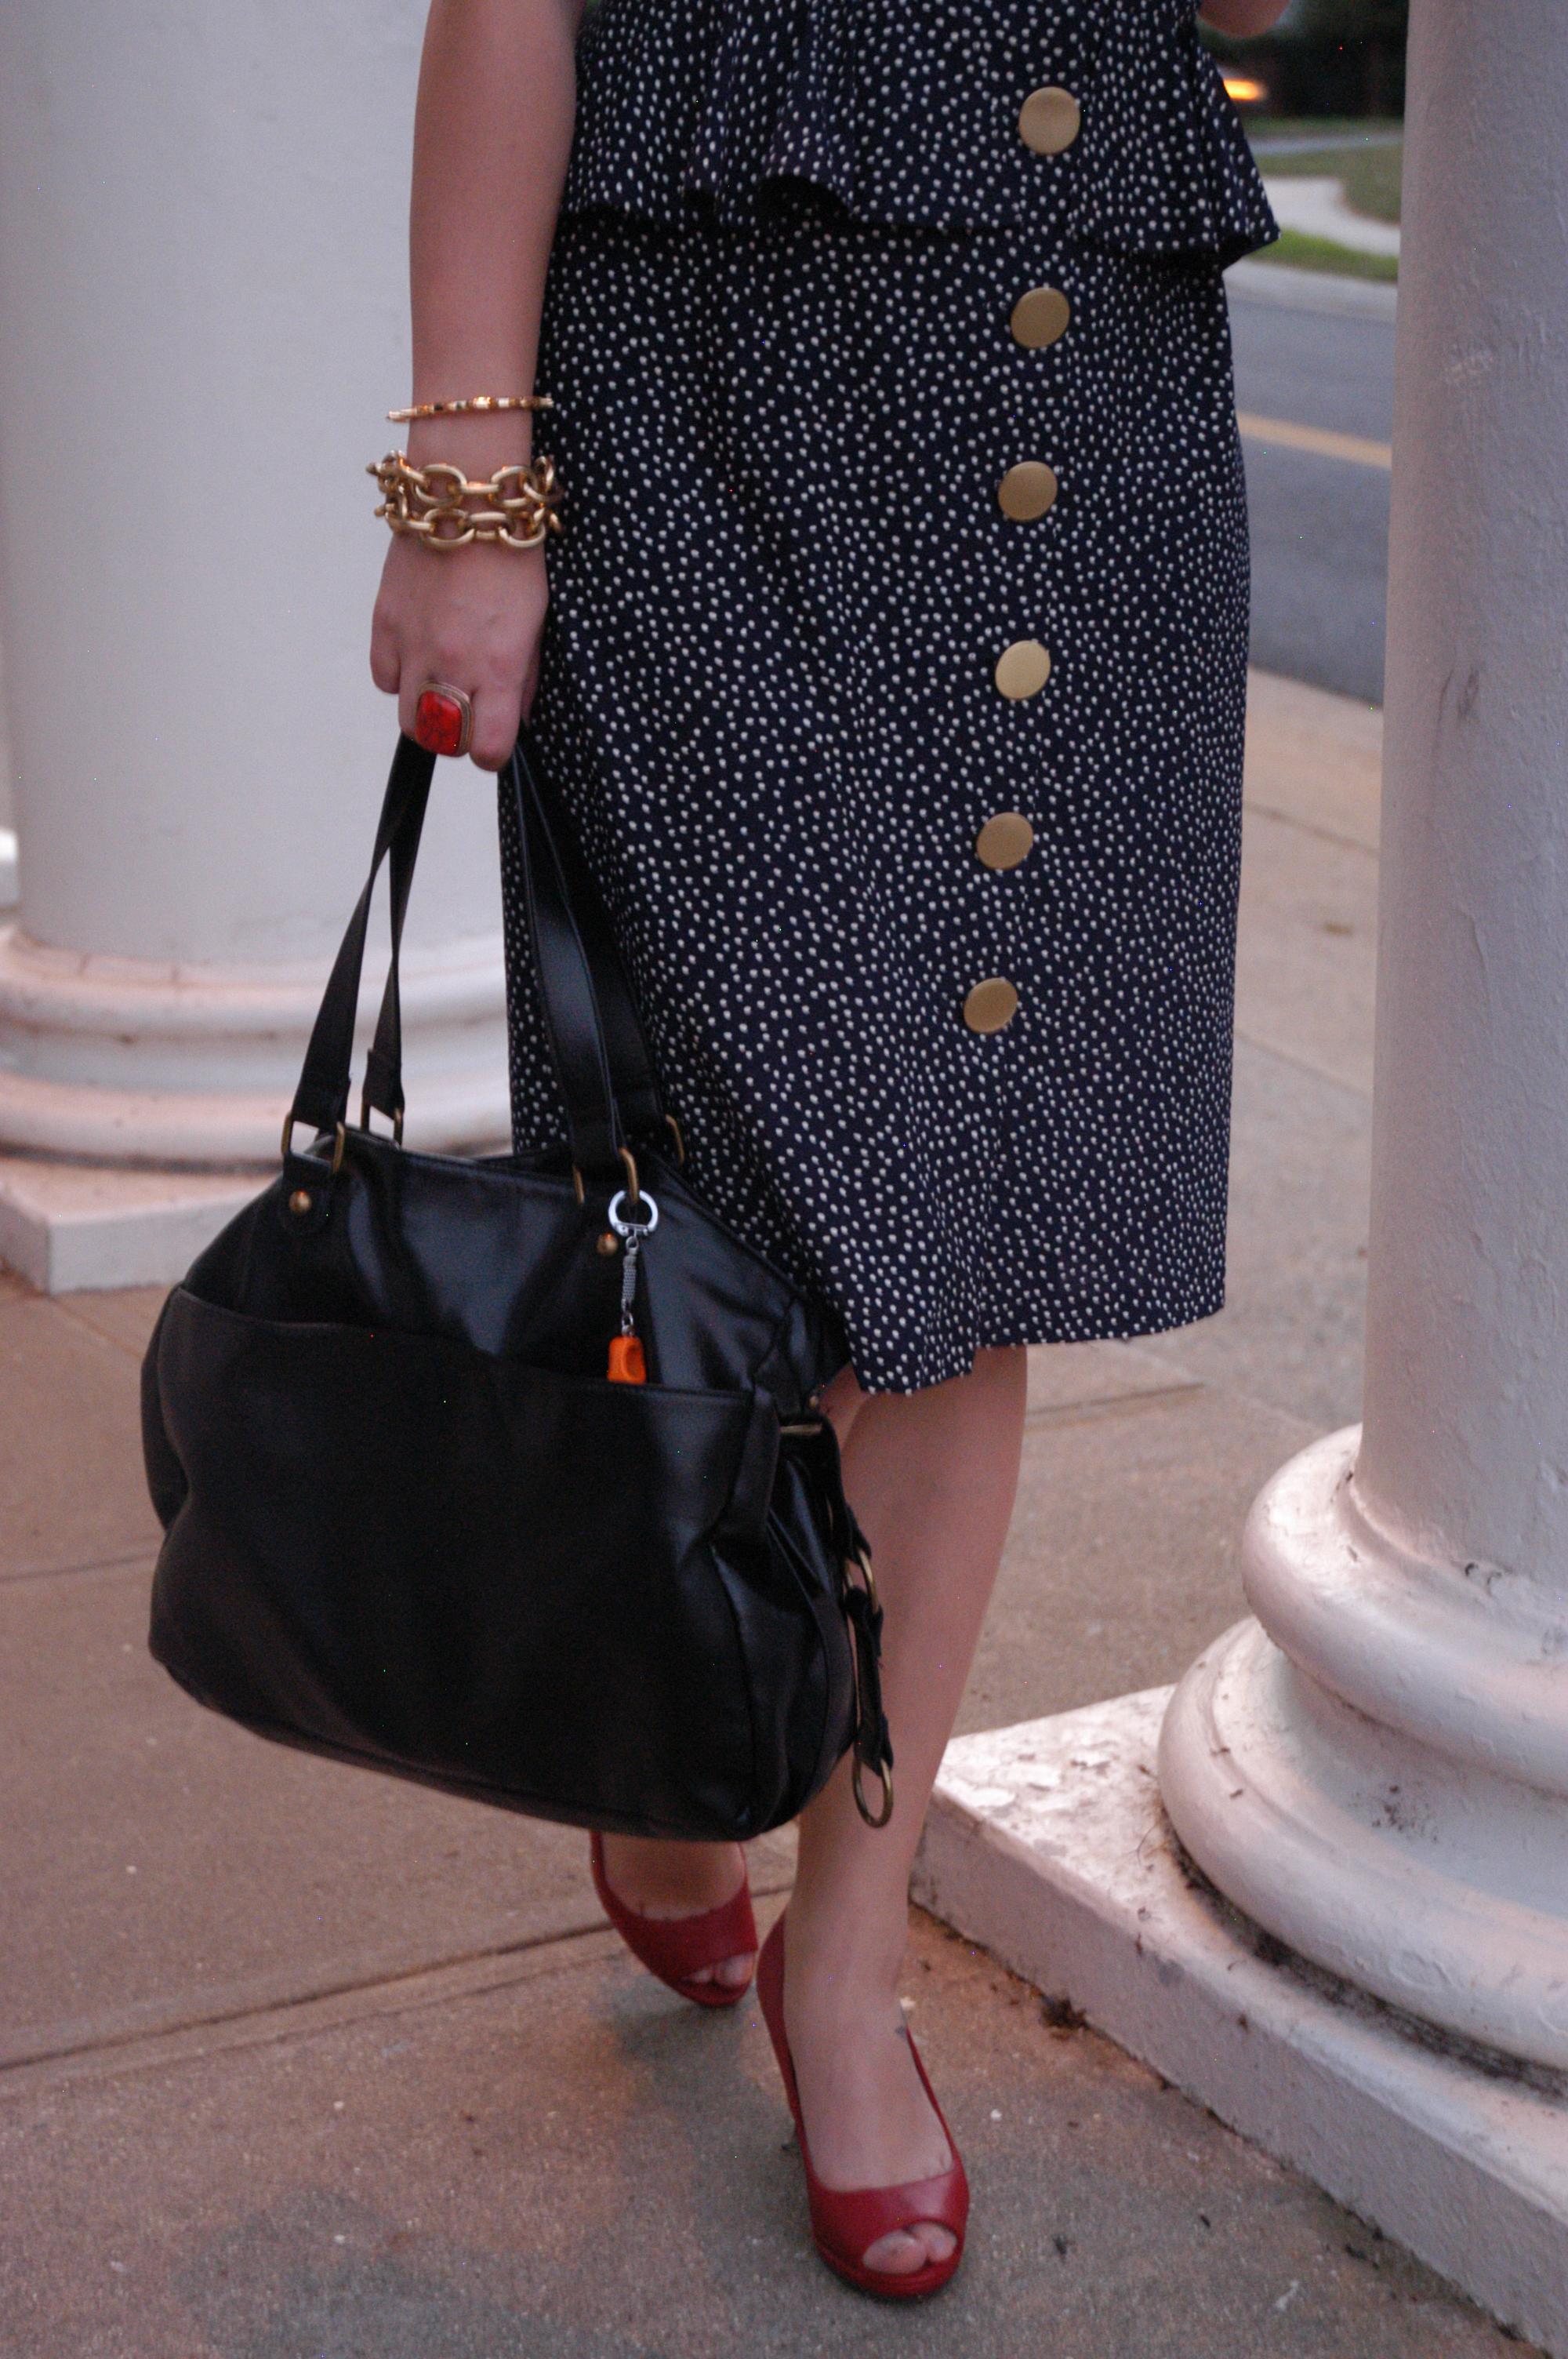 Dress: Vintage   Shoes: Target   Purse: Target   Jewelry: H&M, Joann Fabrics, 2020Ave, Target